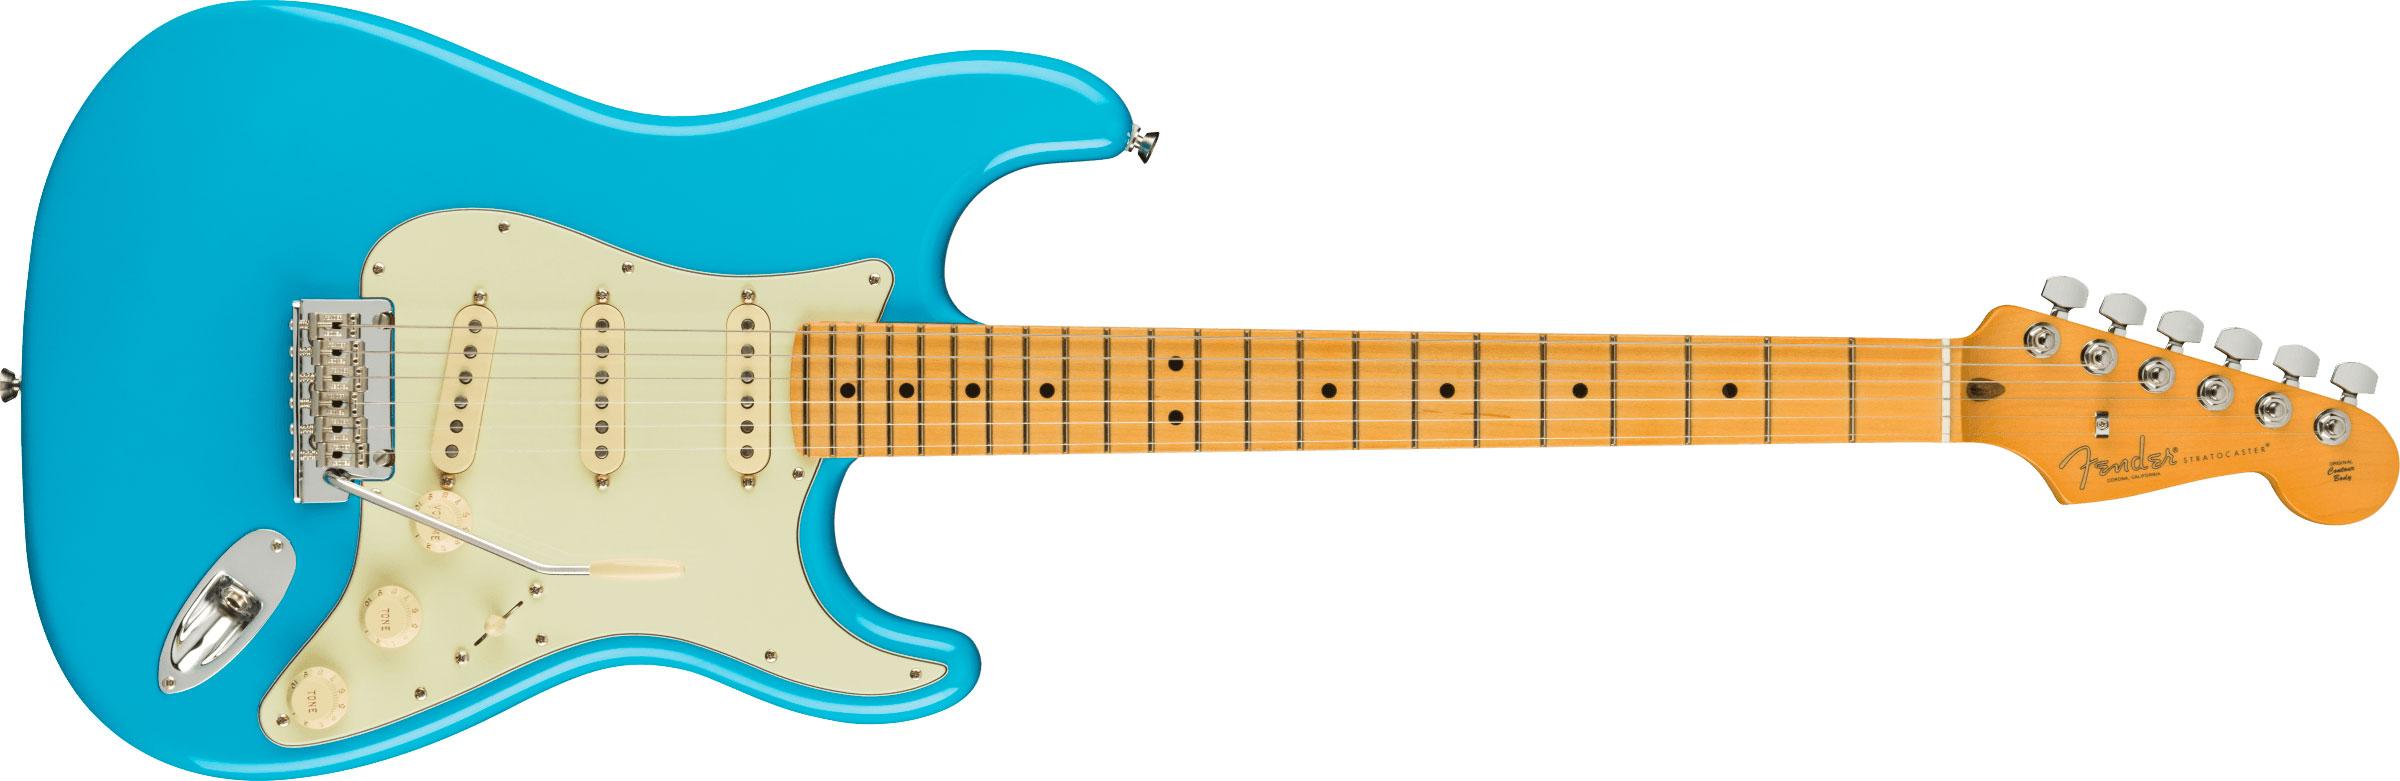 American Professional II Stratocaster (2020-) 画像1